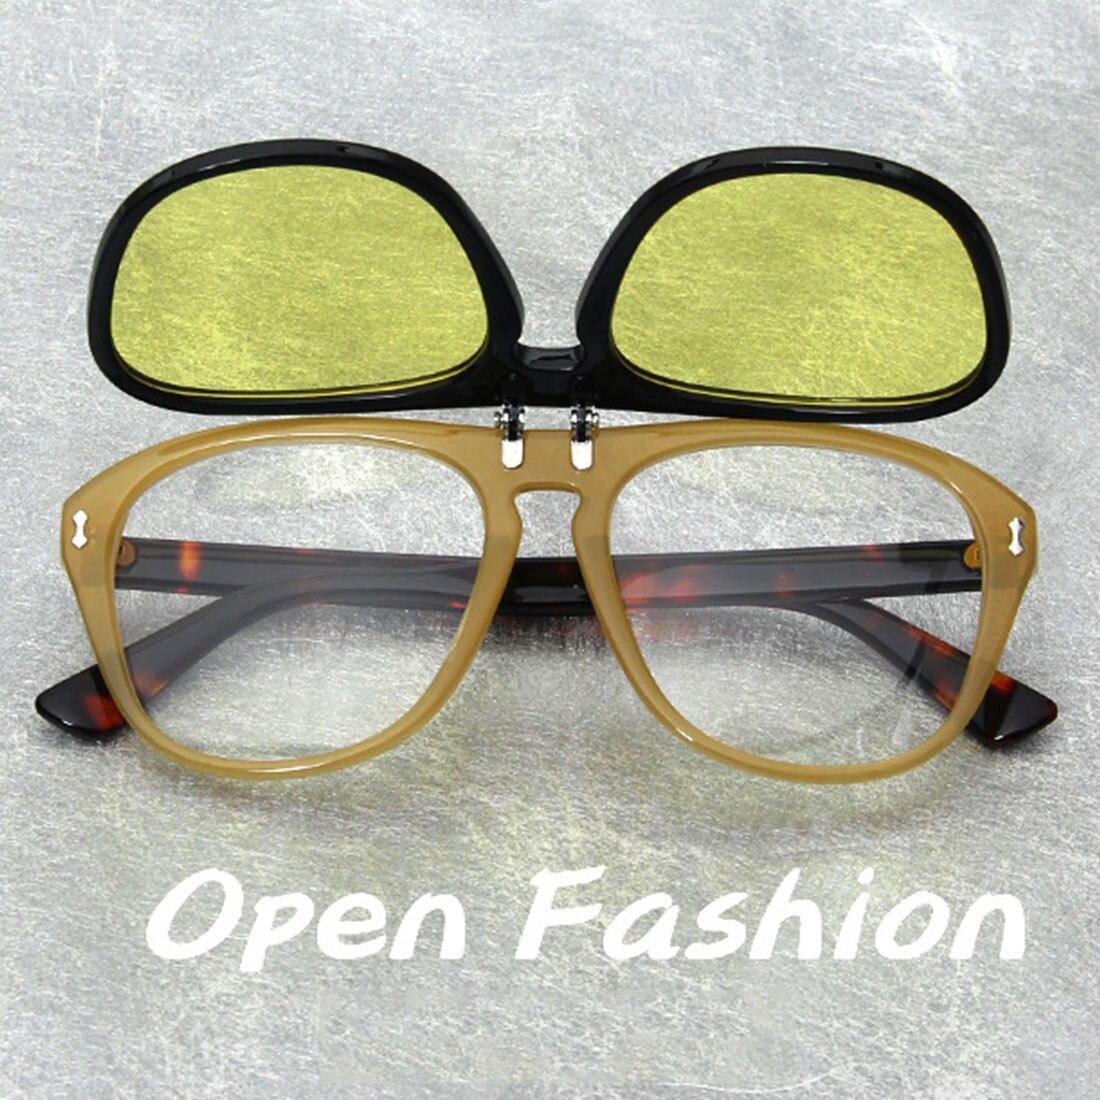 flip up sunglasses men fashion black unisex women sun glasses with yellow lenses summer 2019 UV400 lunette soleil femme in Women 39 s Sunglasses from Apparel Accessories